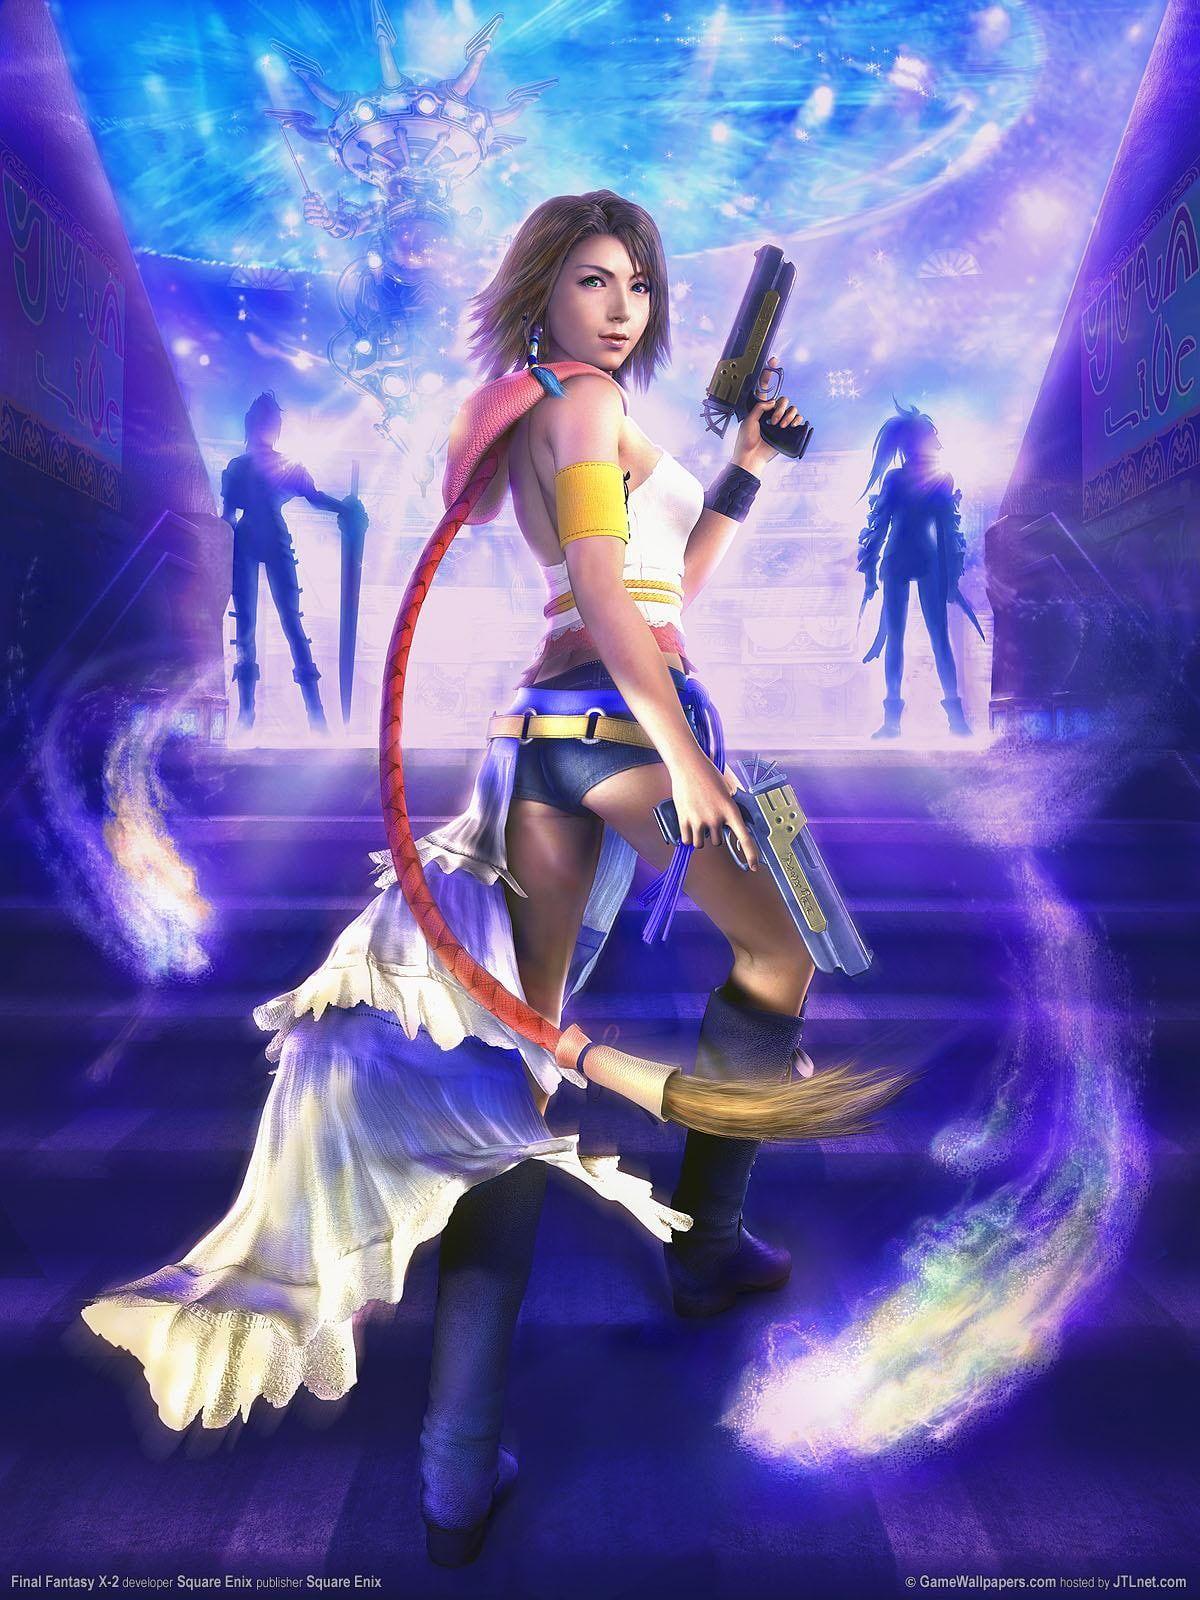 Final Fantasy X 2 Yuna Final Fantasy Final Fantasy X 720p Wallpaper Hdwallpaper Desktop Final Fantasy Girls Final Fantasy X Yuna Final Fantasy